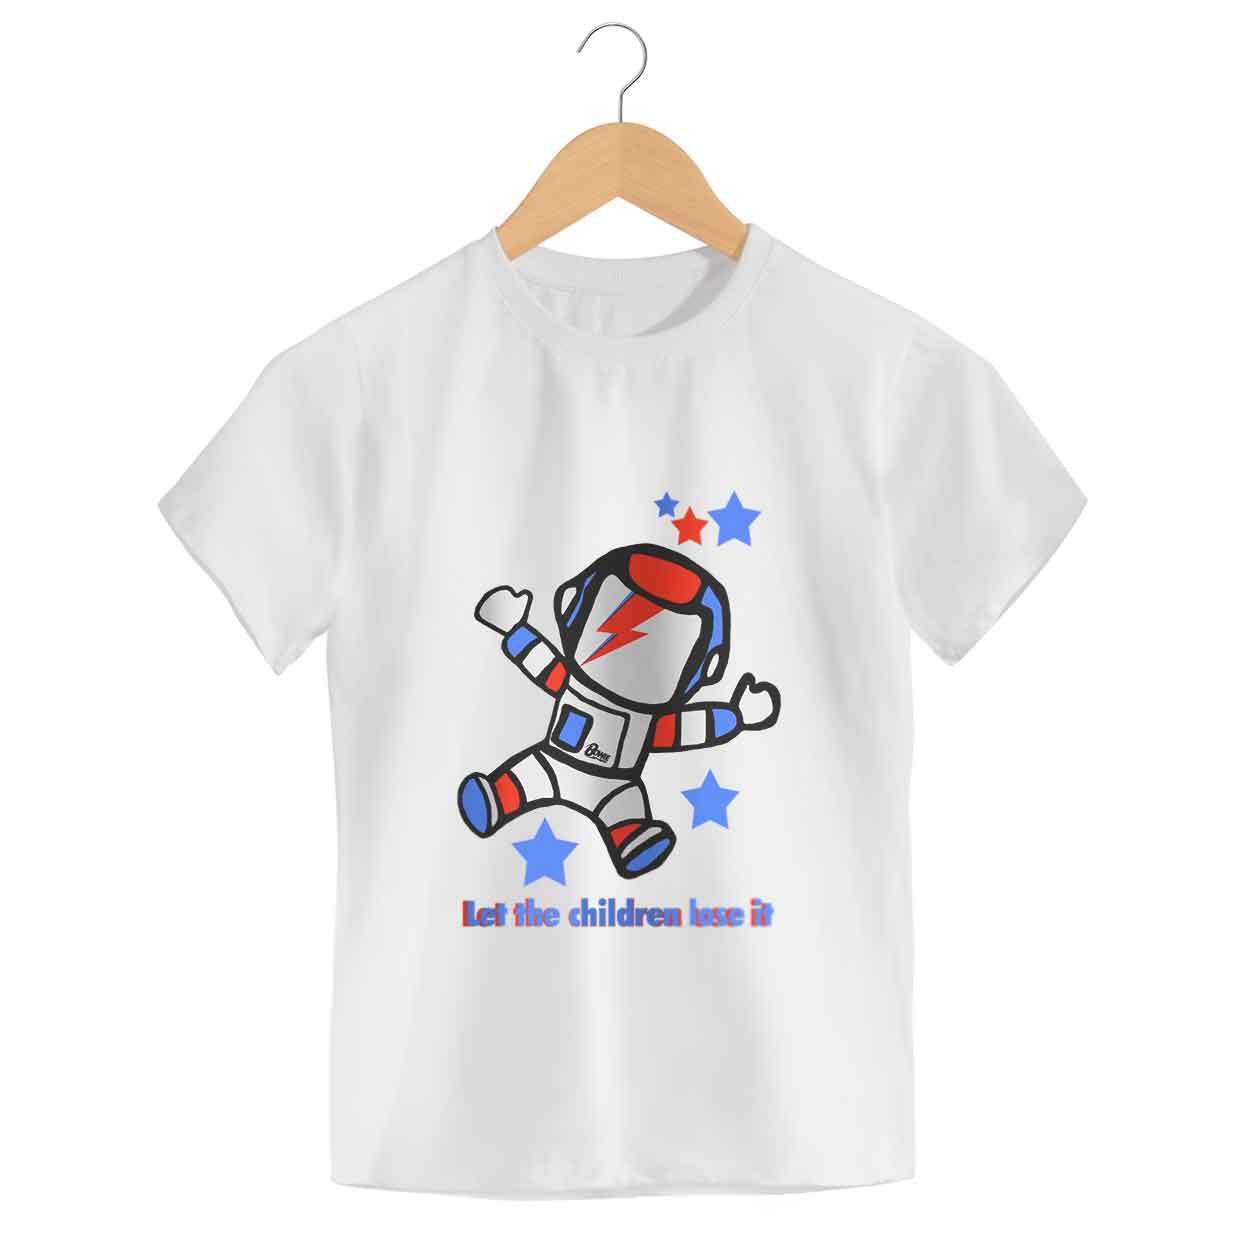 Camiseta Let The Children Lose It - Infantil